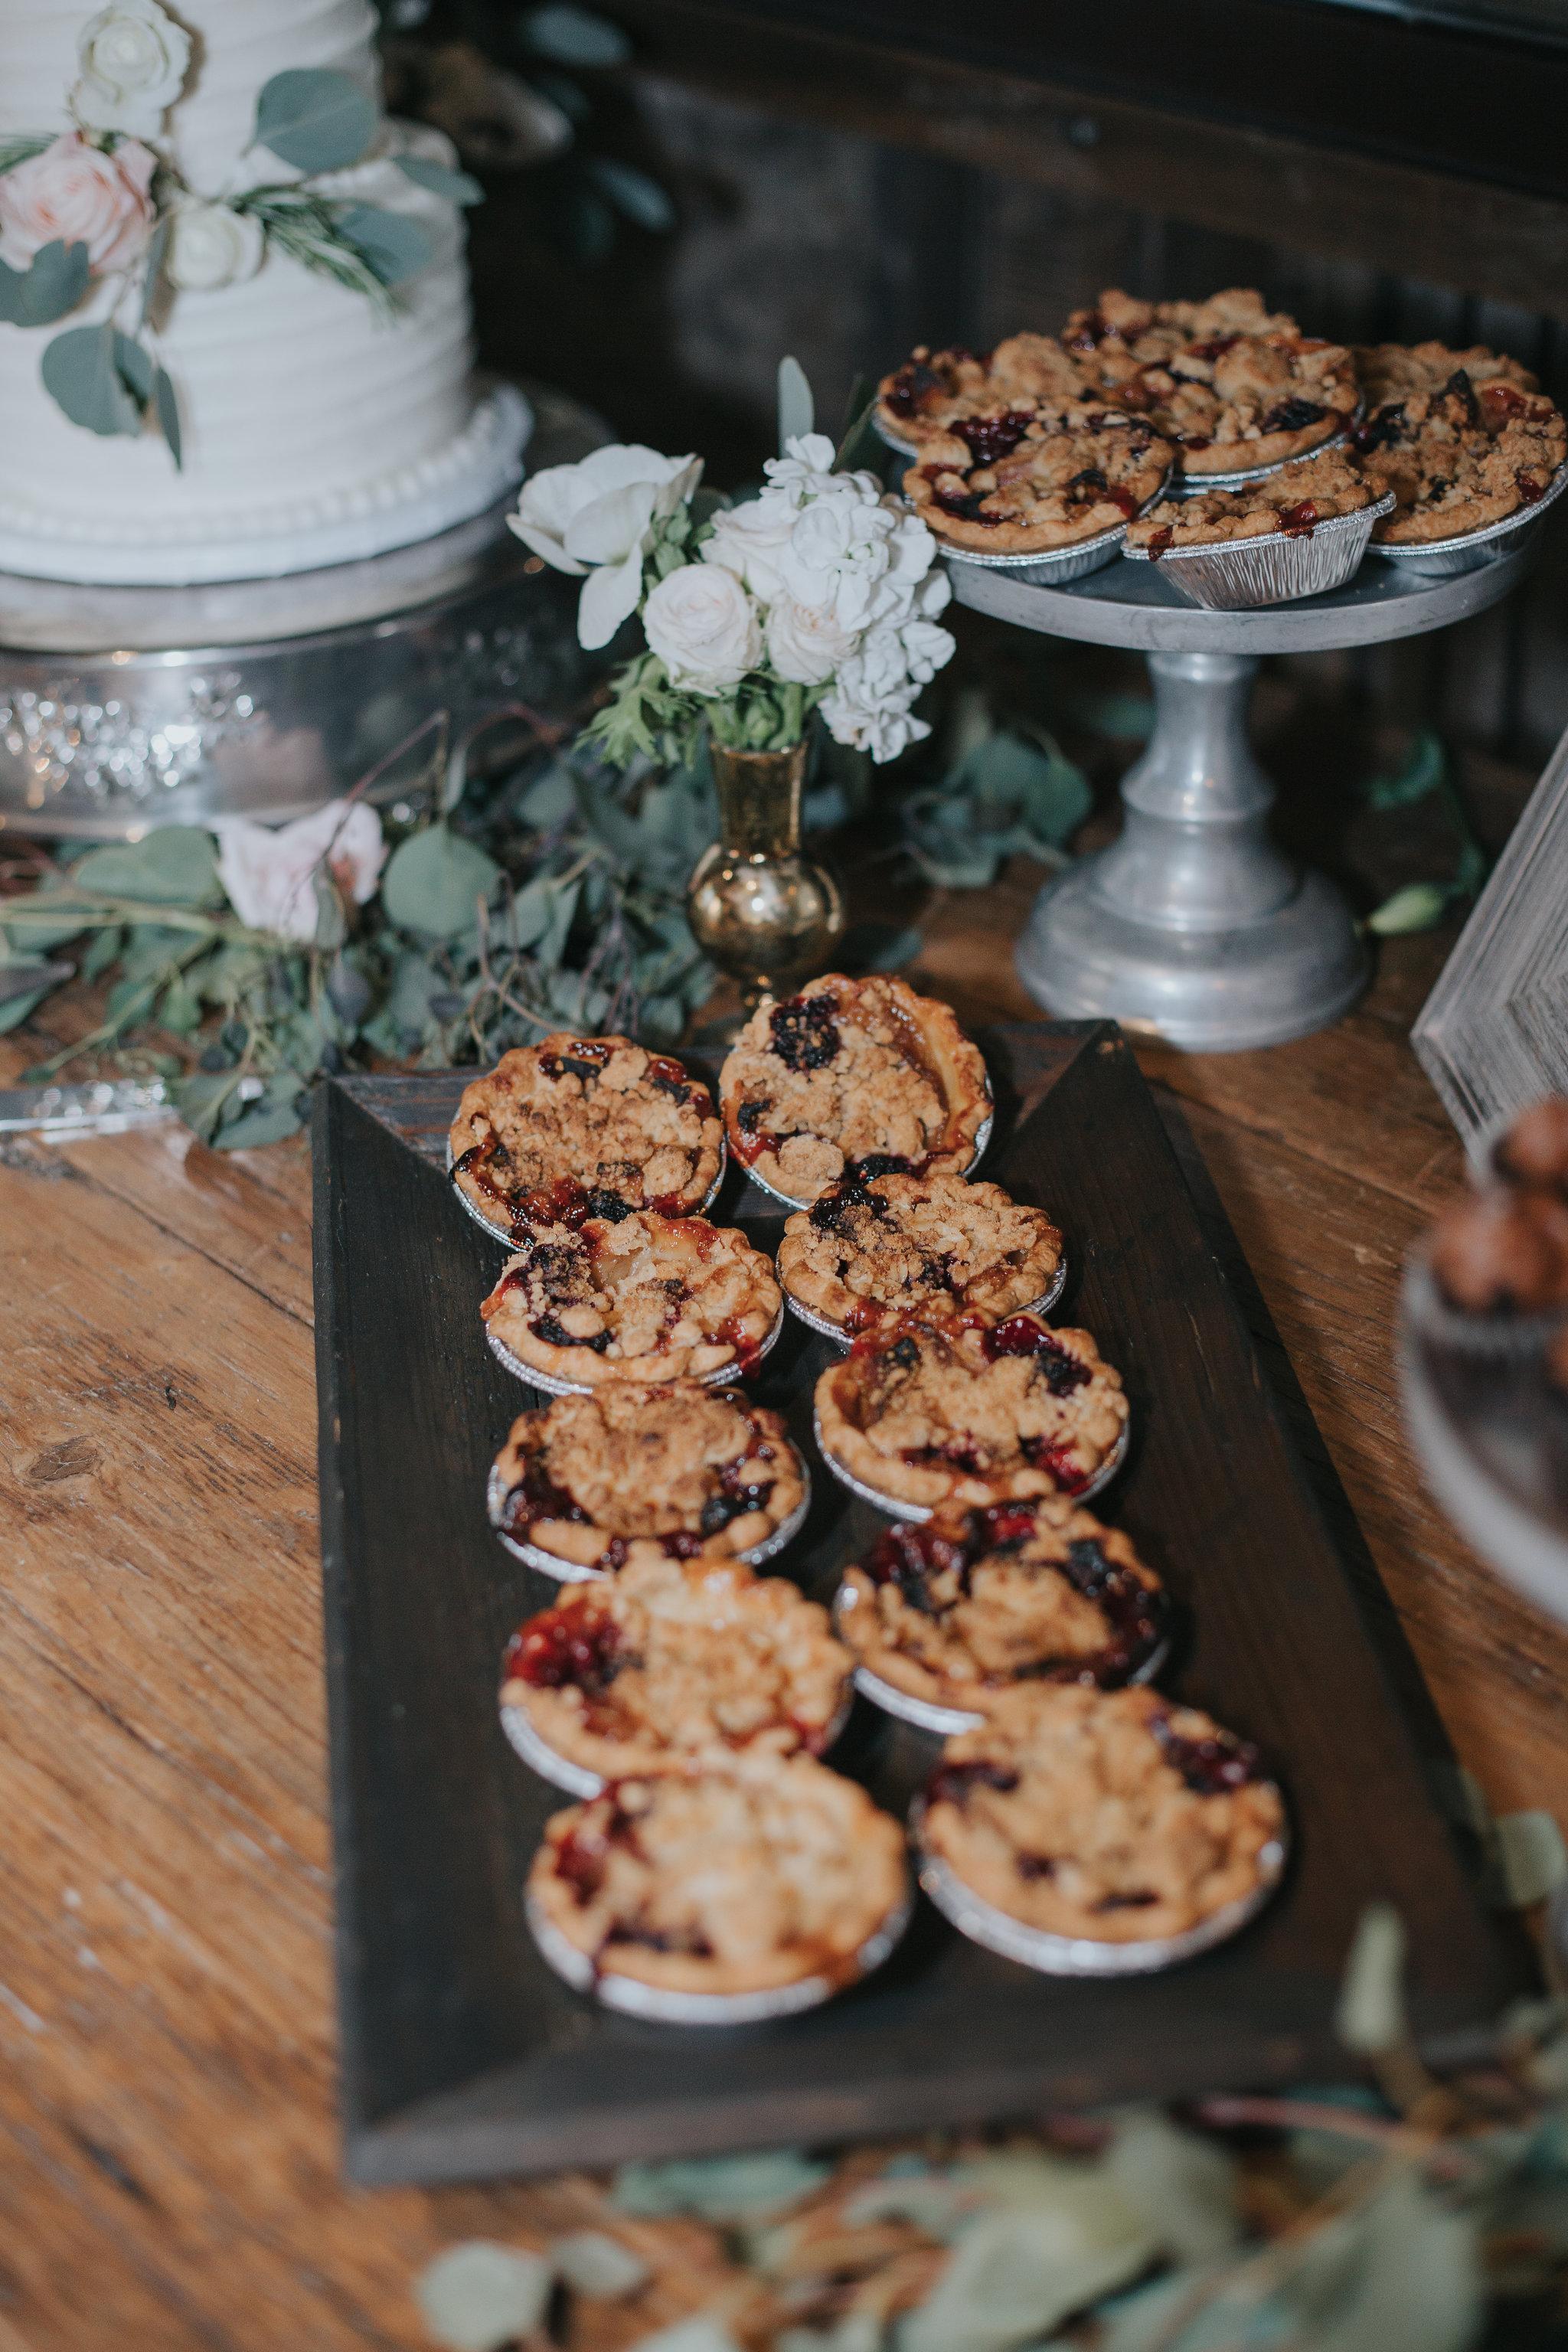 rus-farm-wedding-heald-wedding-consulting-hwc-pies-dessert.jpg